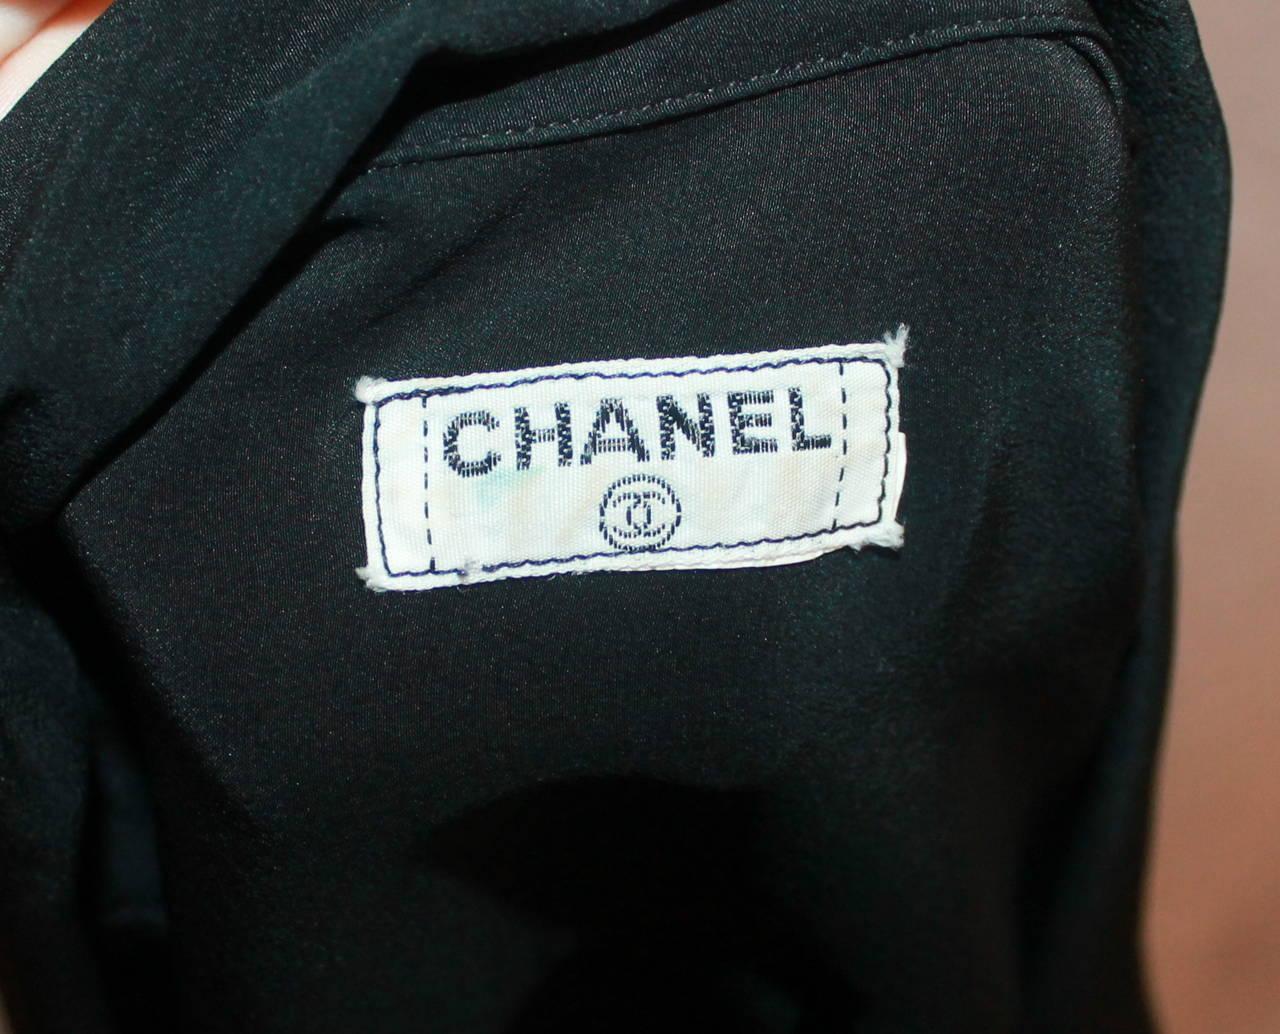 Chanel 1980's Vintage Black Silk Chiffon Long Sleeve Blouse - M For Sale 2